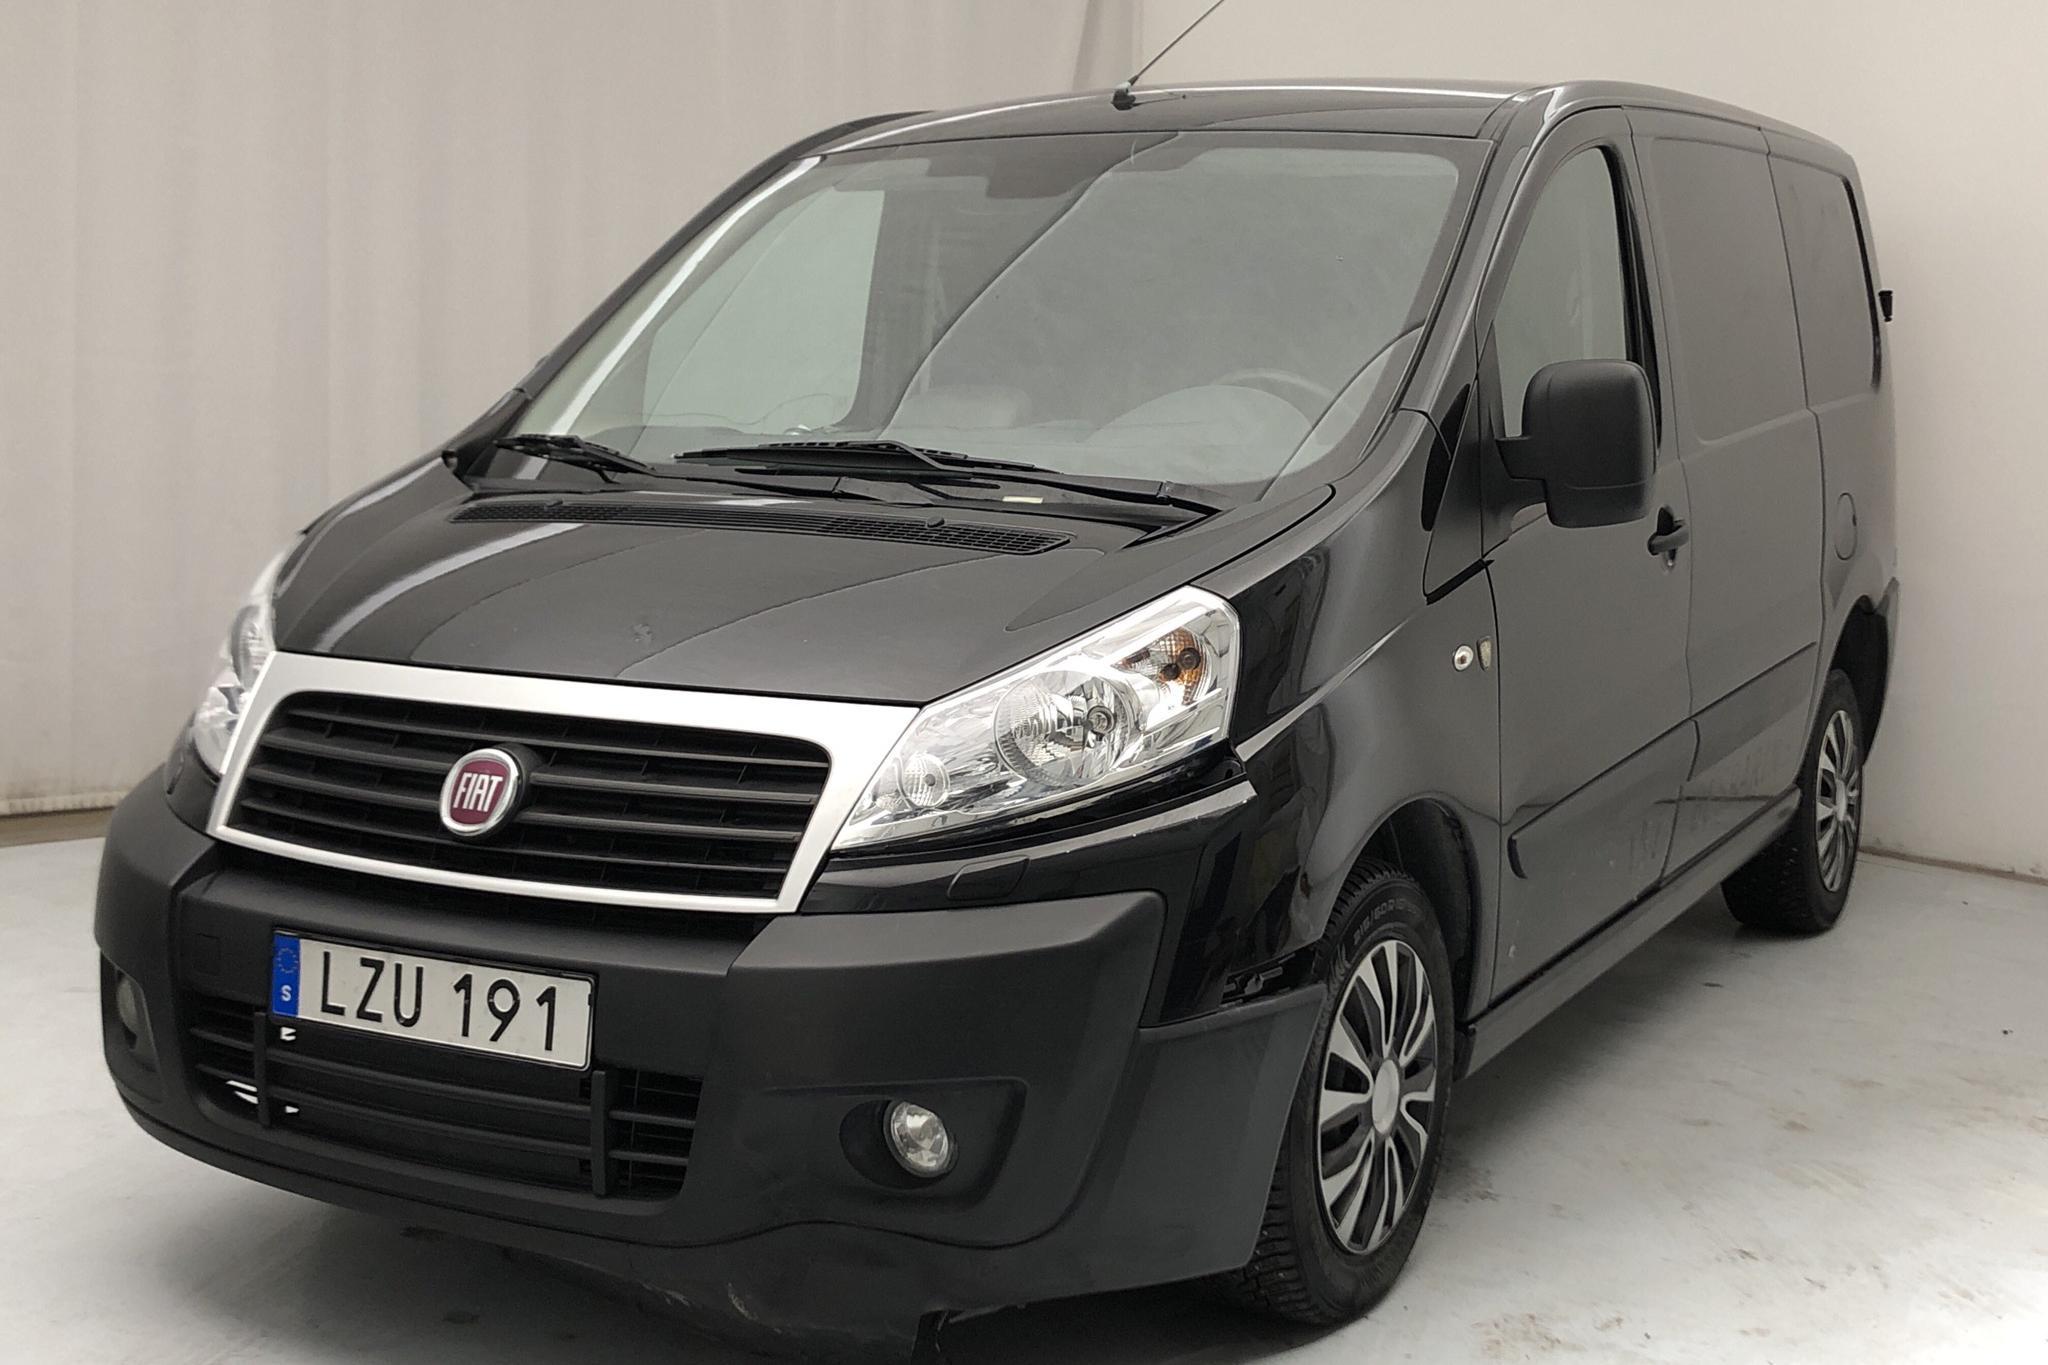 Fiat Scudo 2.0 MJT (130hk)